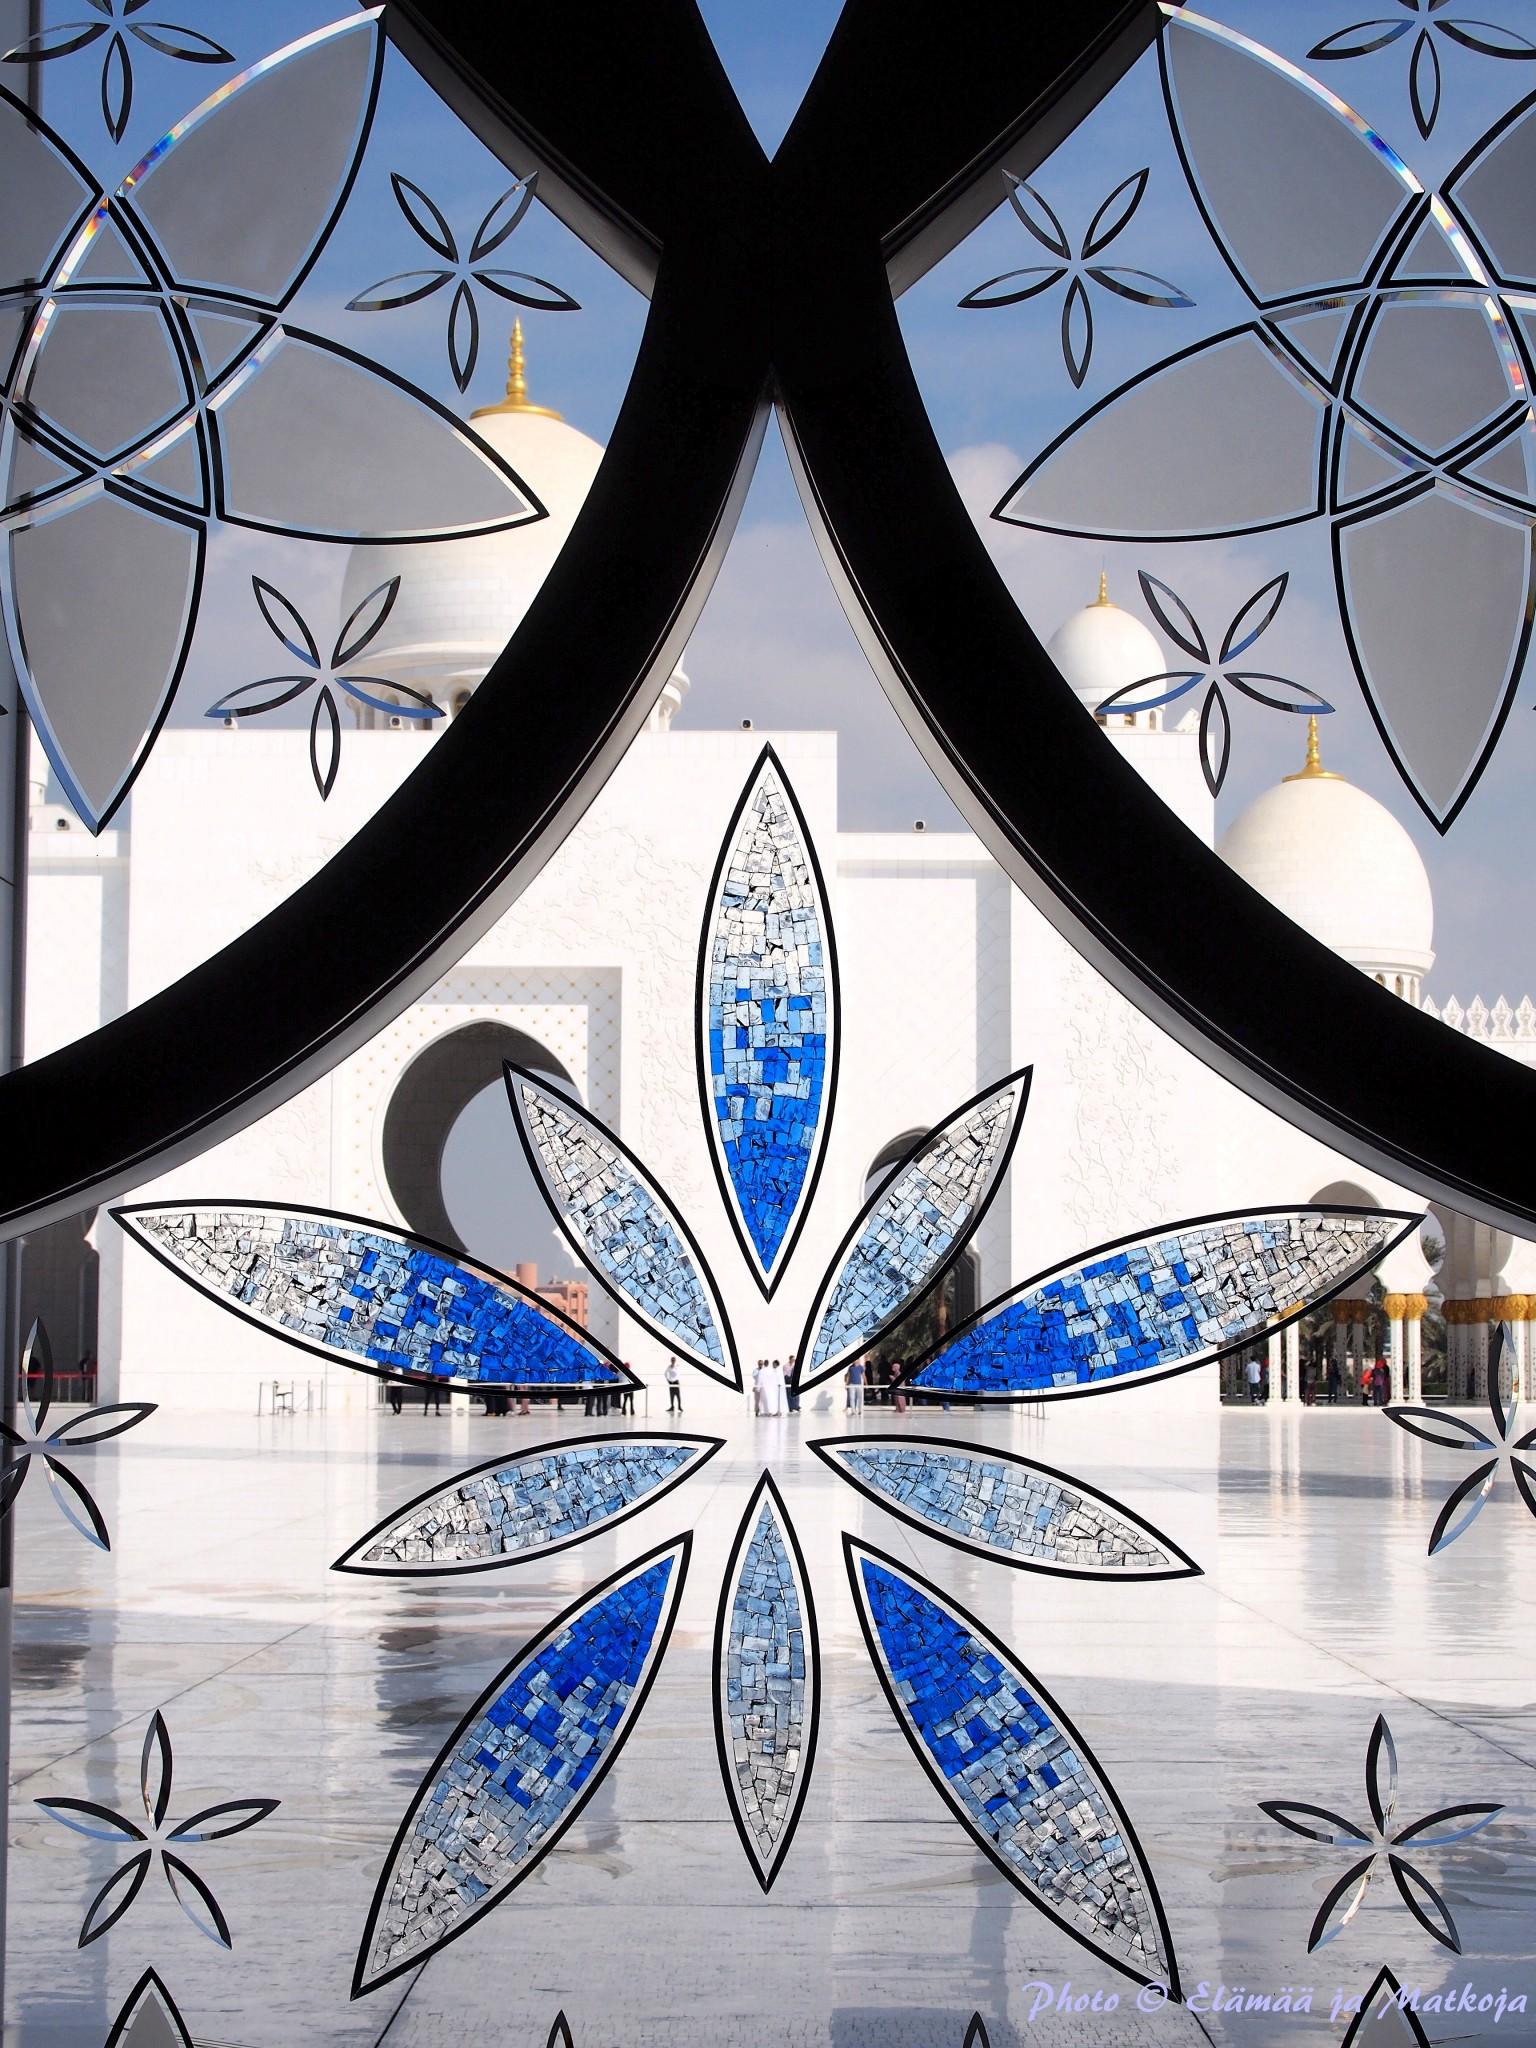 Sheikh Zayed Grand Mosque Abu Dhabi UAE 5 Photo © Elämää ja Matkoja